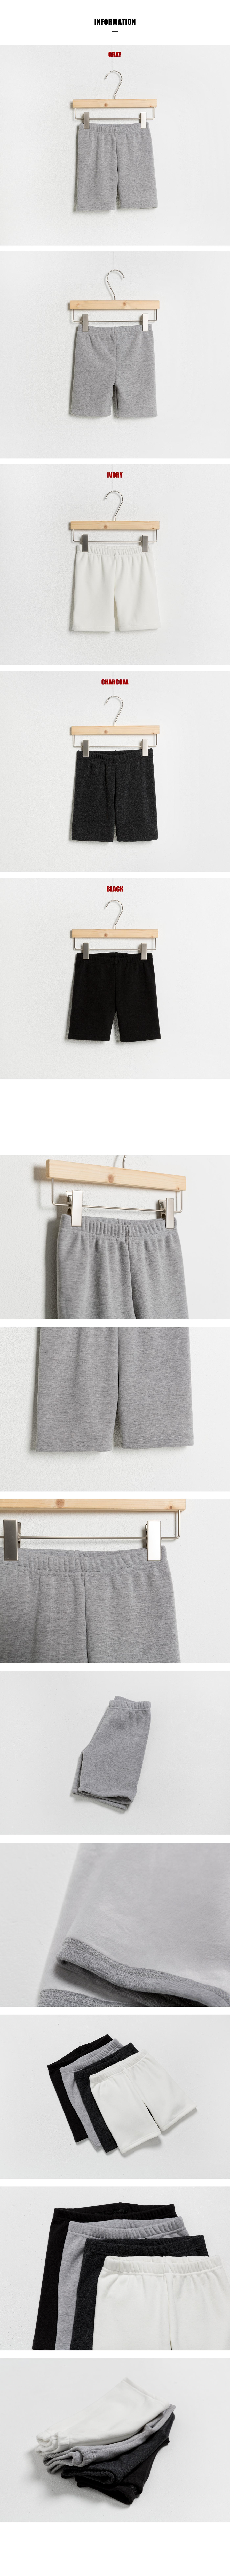 Fogny brushed underpants